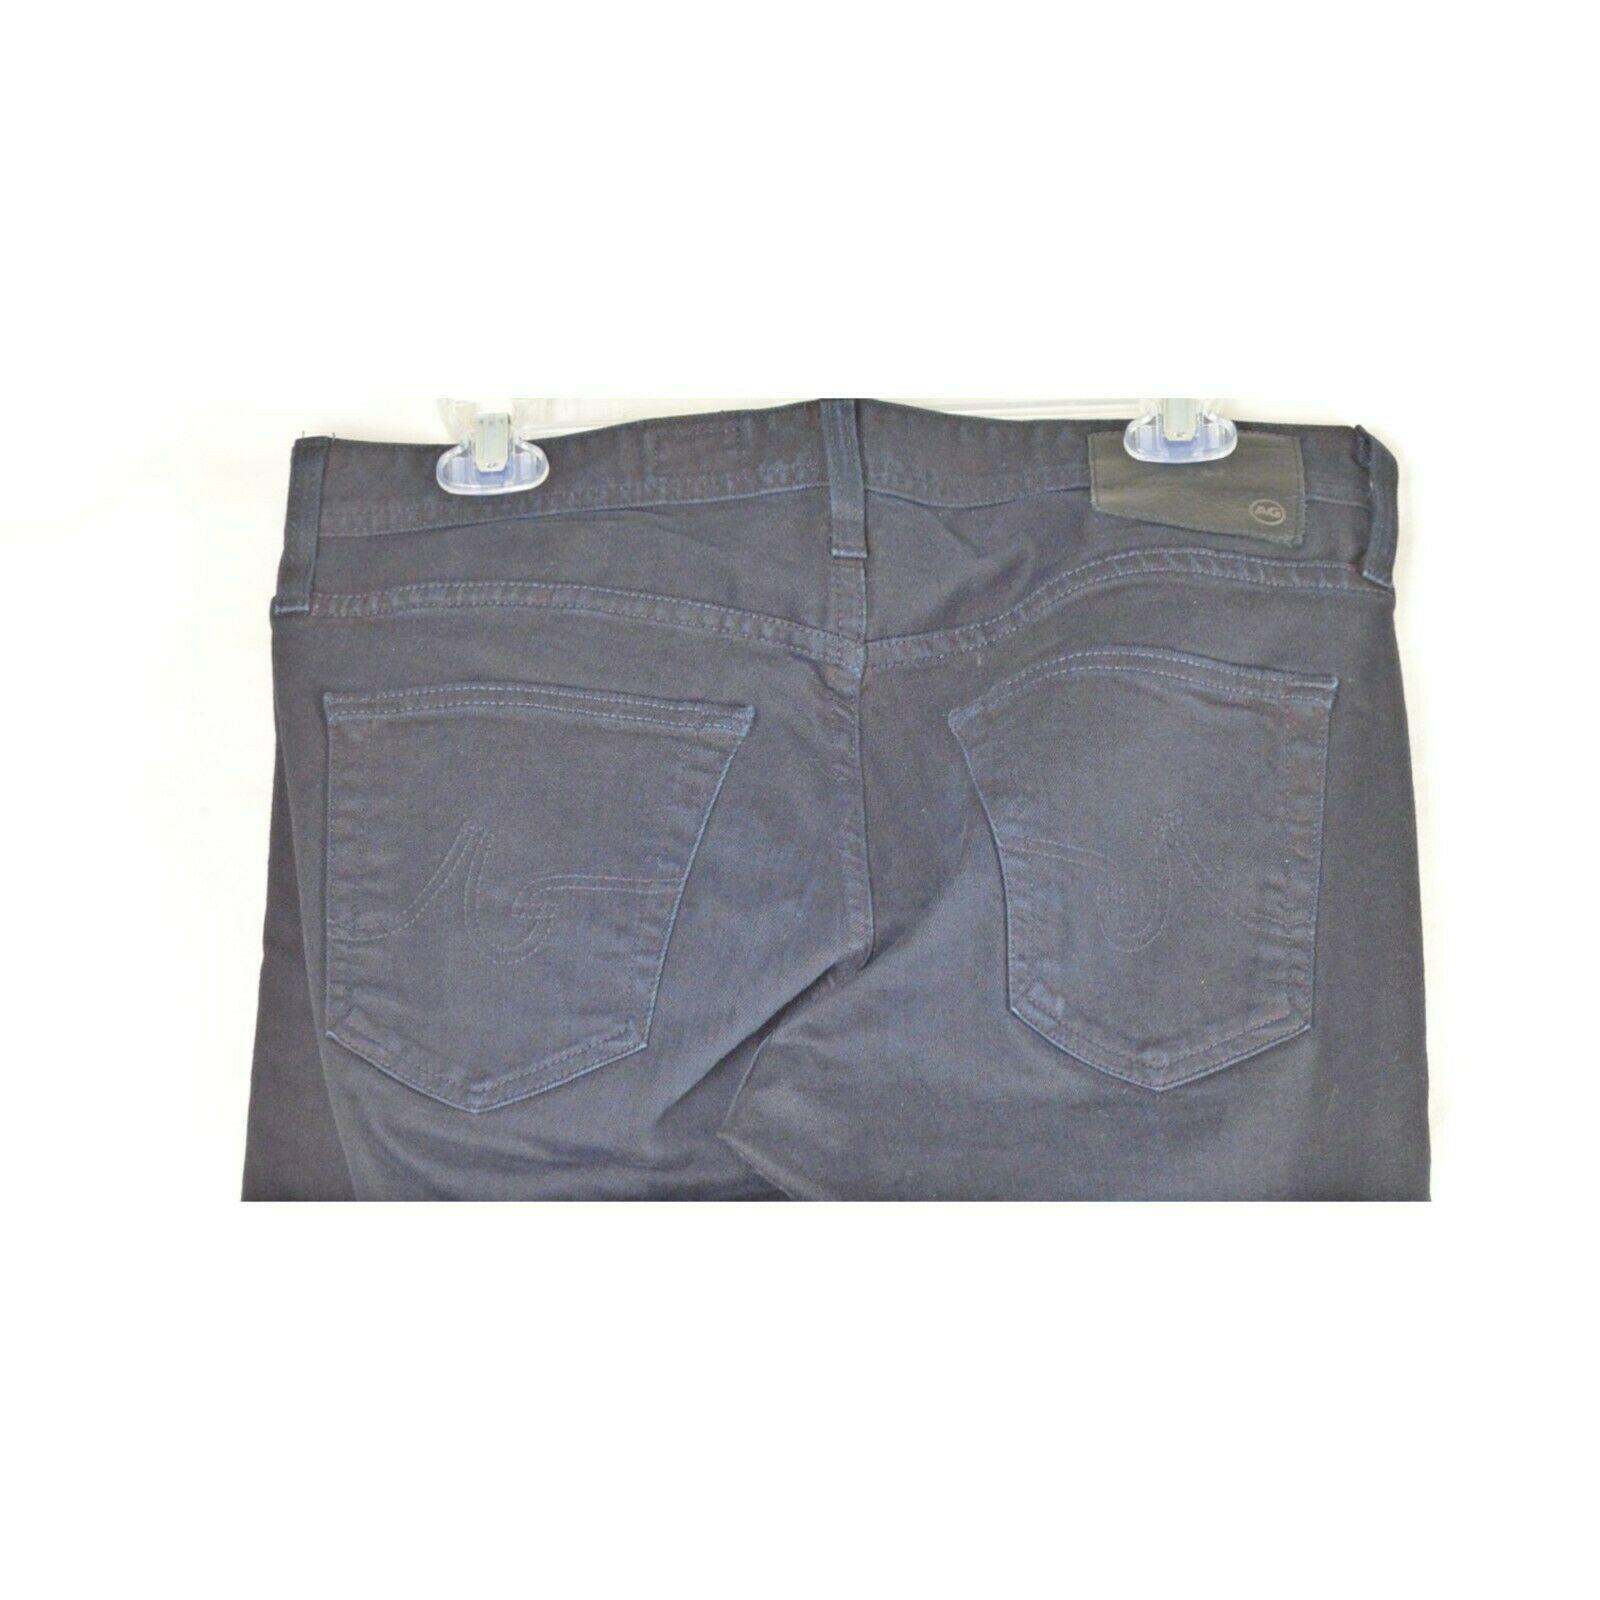 AG Adriano Goldschmied jeans 30 x 34 men Matchbox dark Slim Straight tall unique image 9